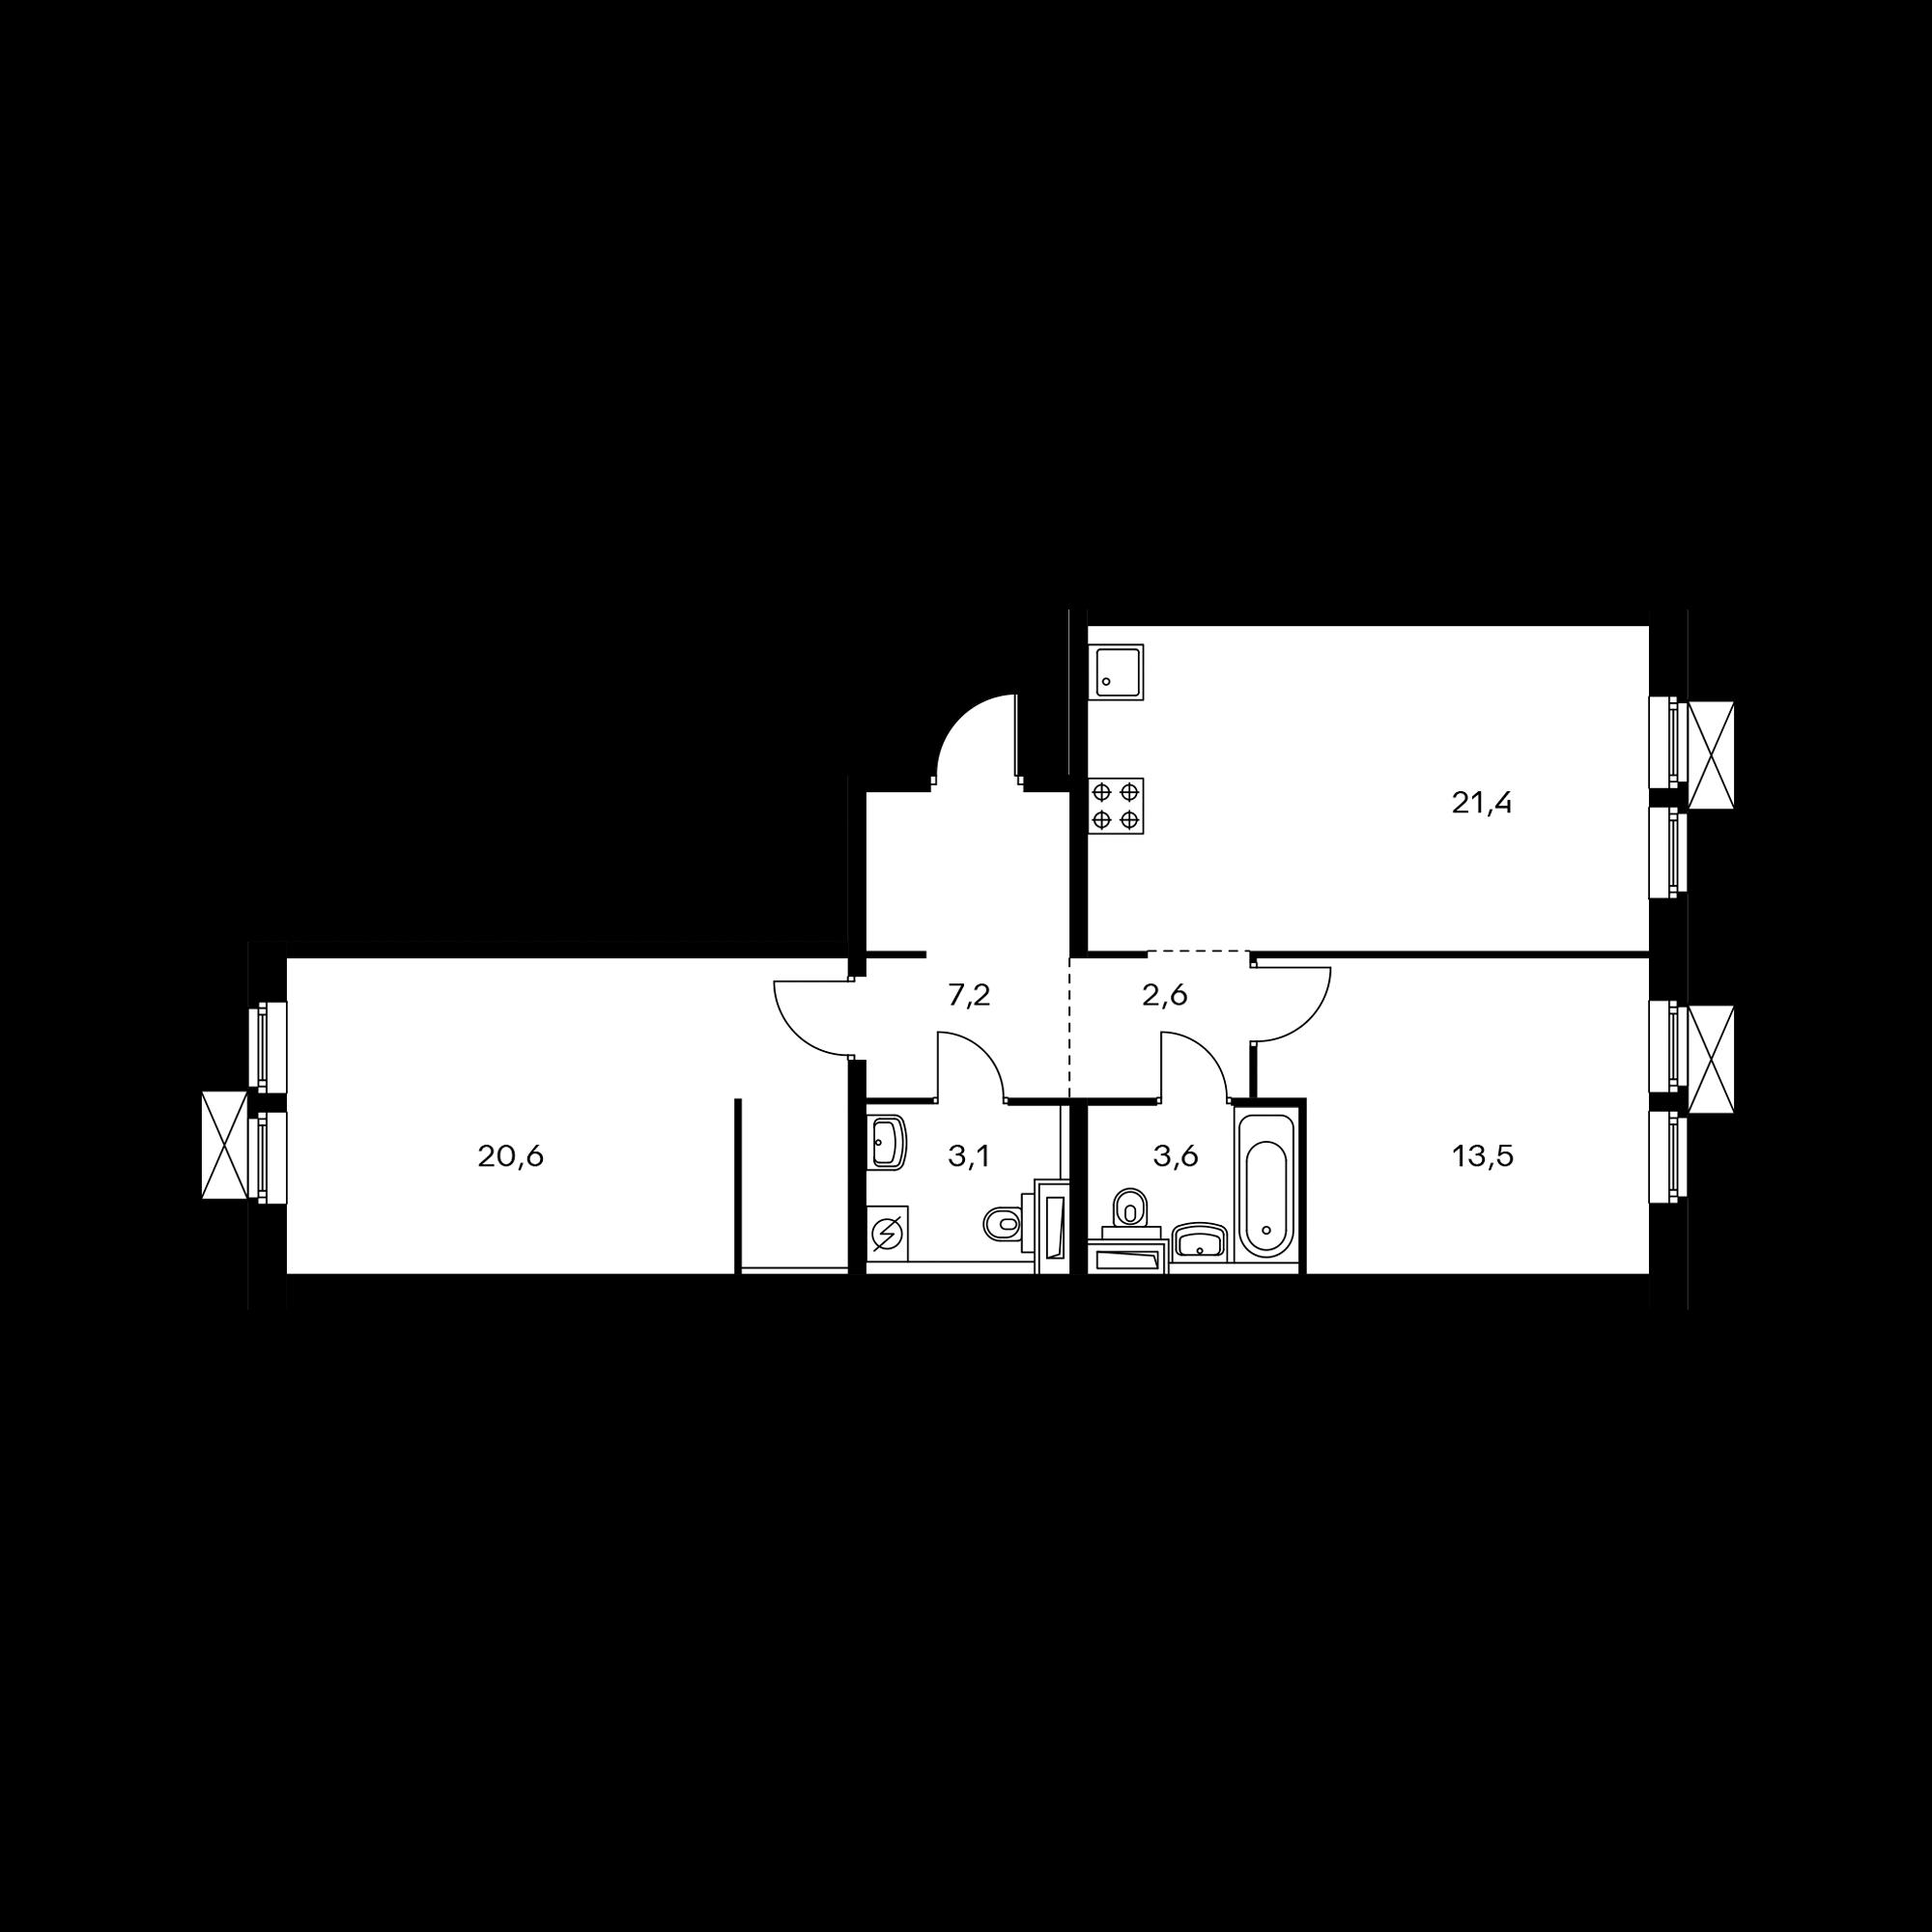 2EL3_7.2-5